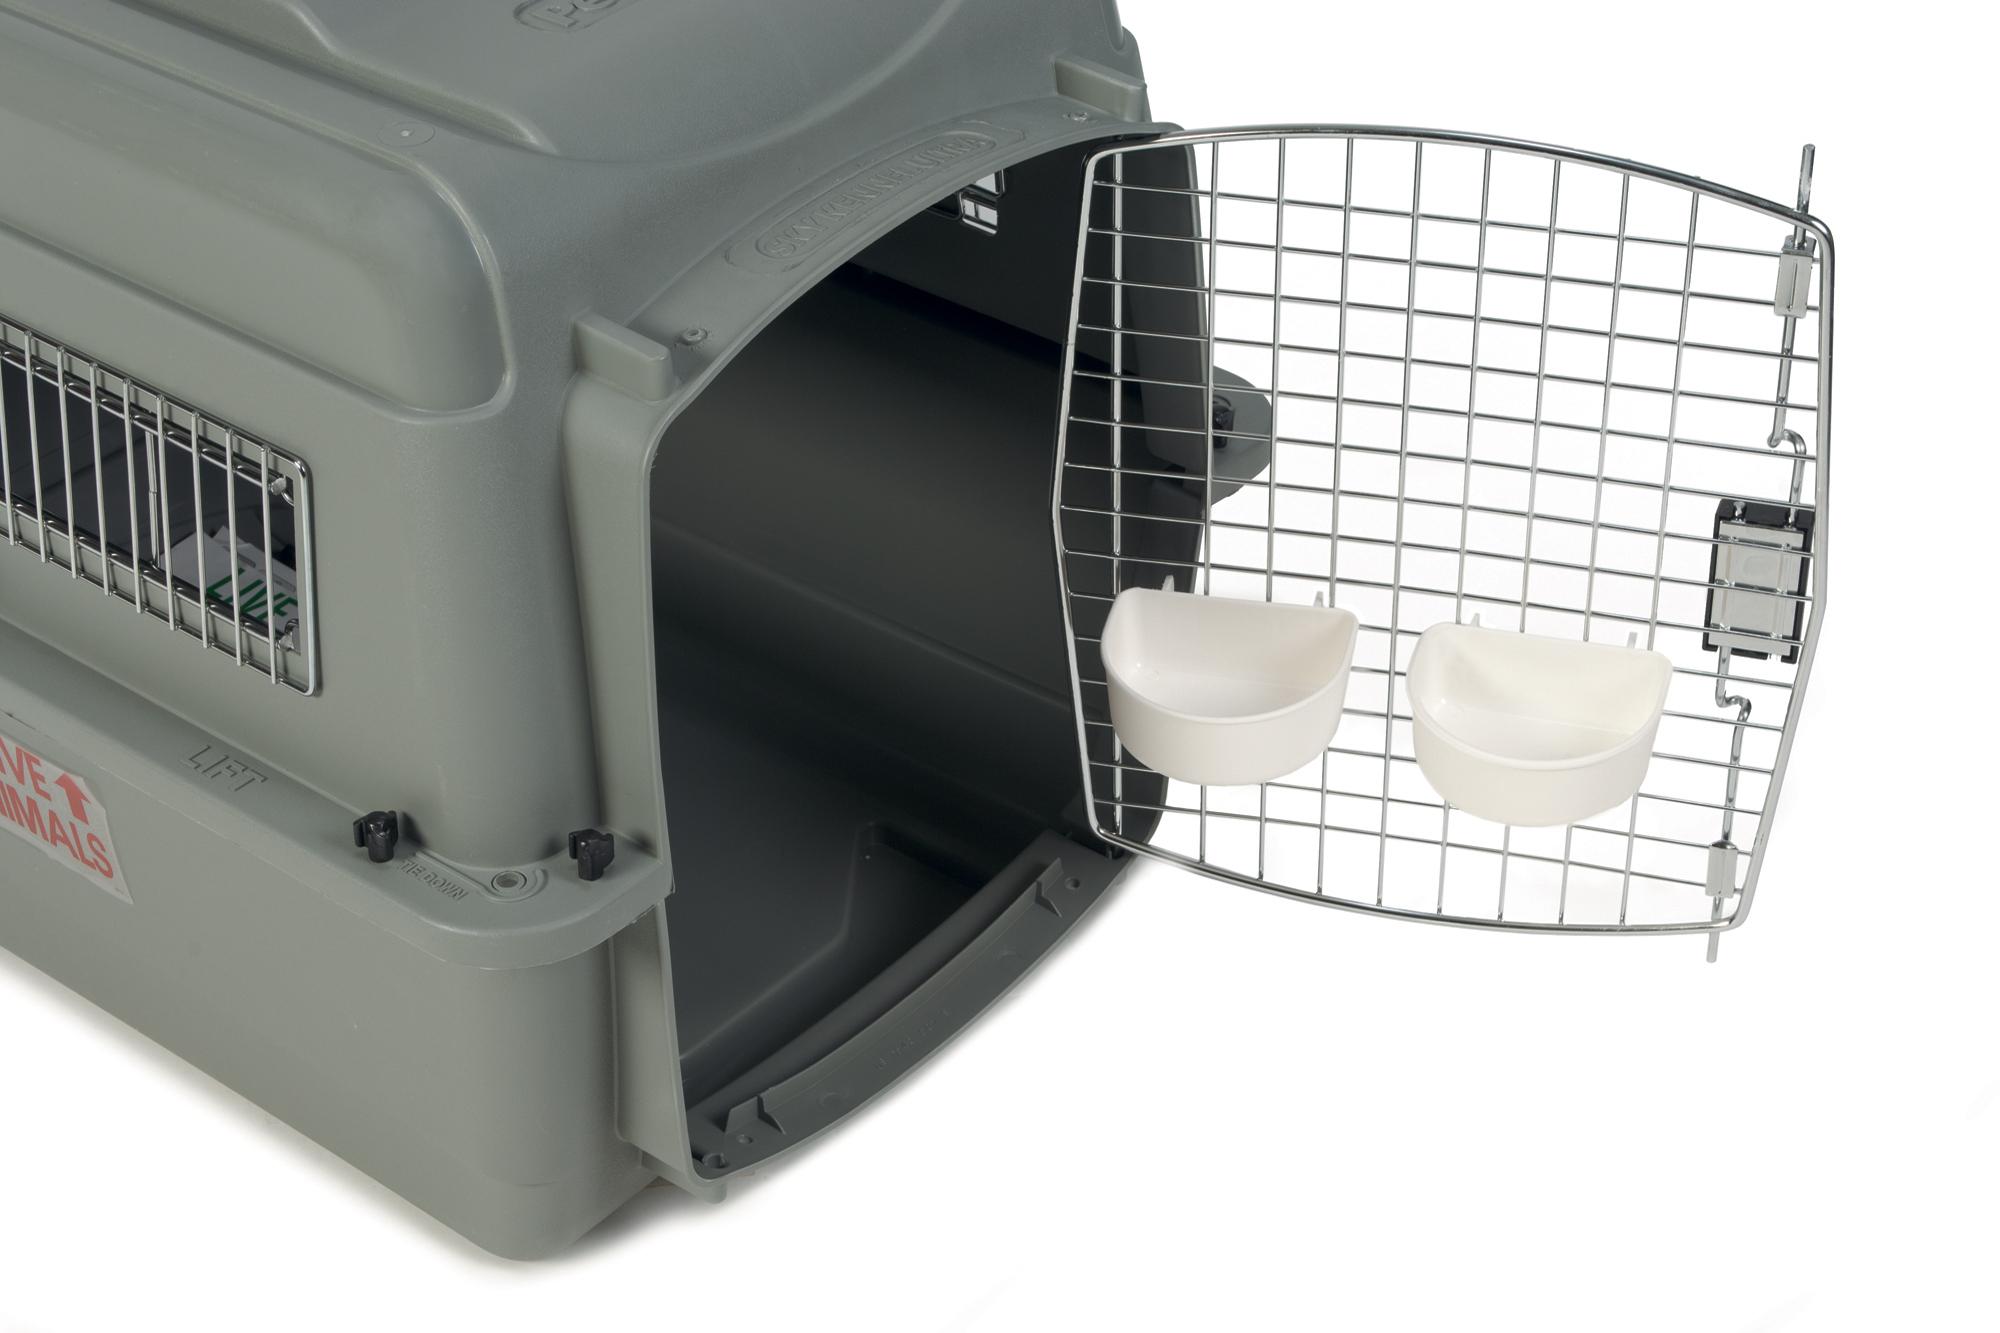 Sky Kennel Giant plastbur Hundburar plast Dörr Väskor Hundburar Hund Sortiment Gibbon